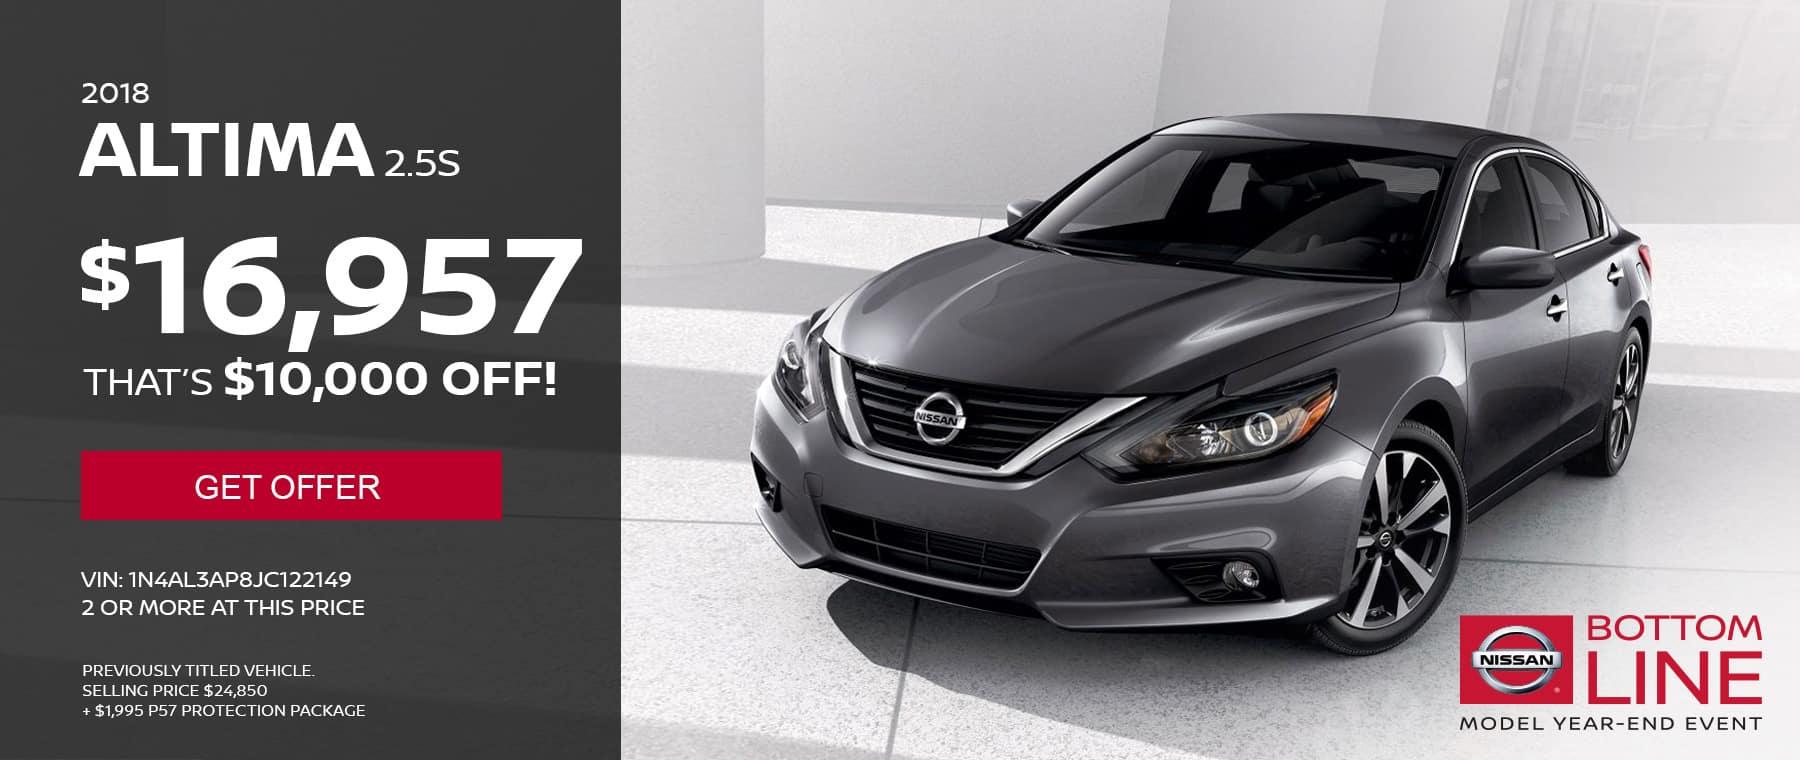 Nissan Dealership Miami FL | Hialeah | Miramar | Palmetto57